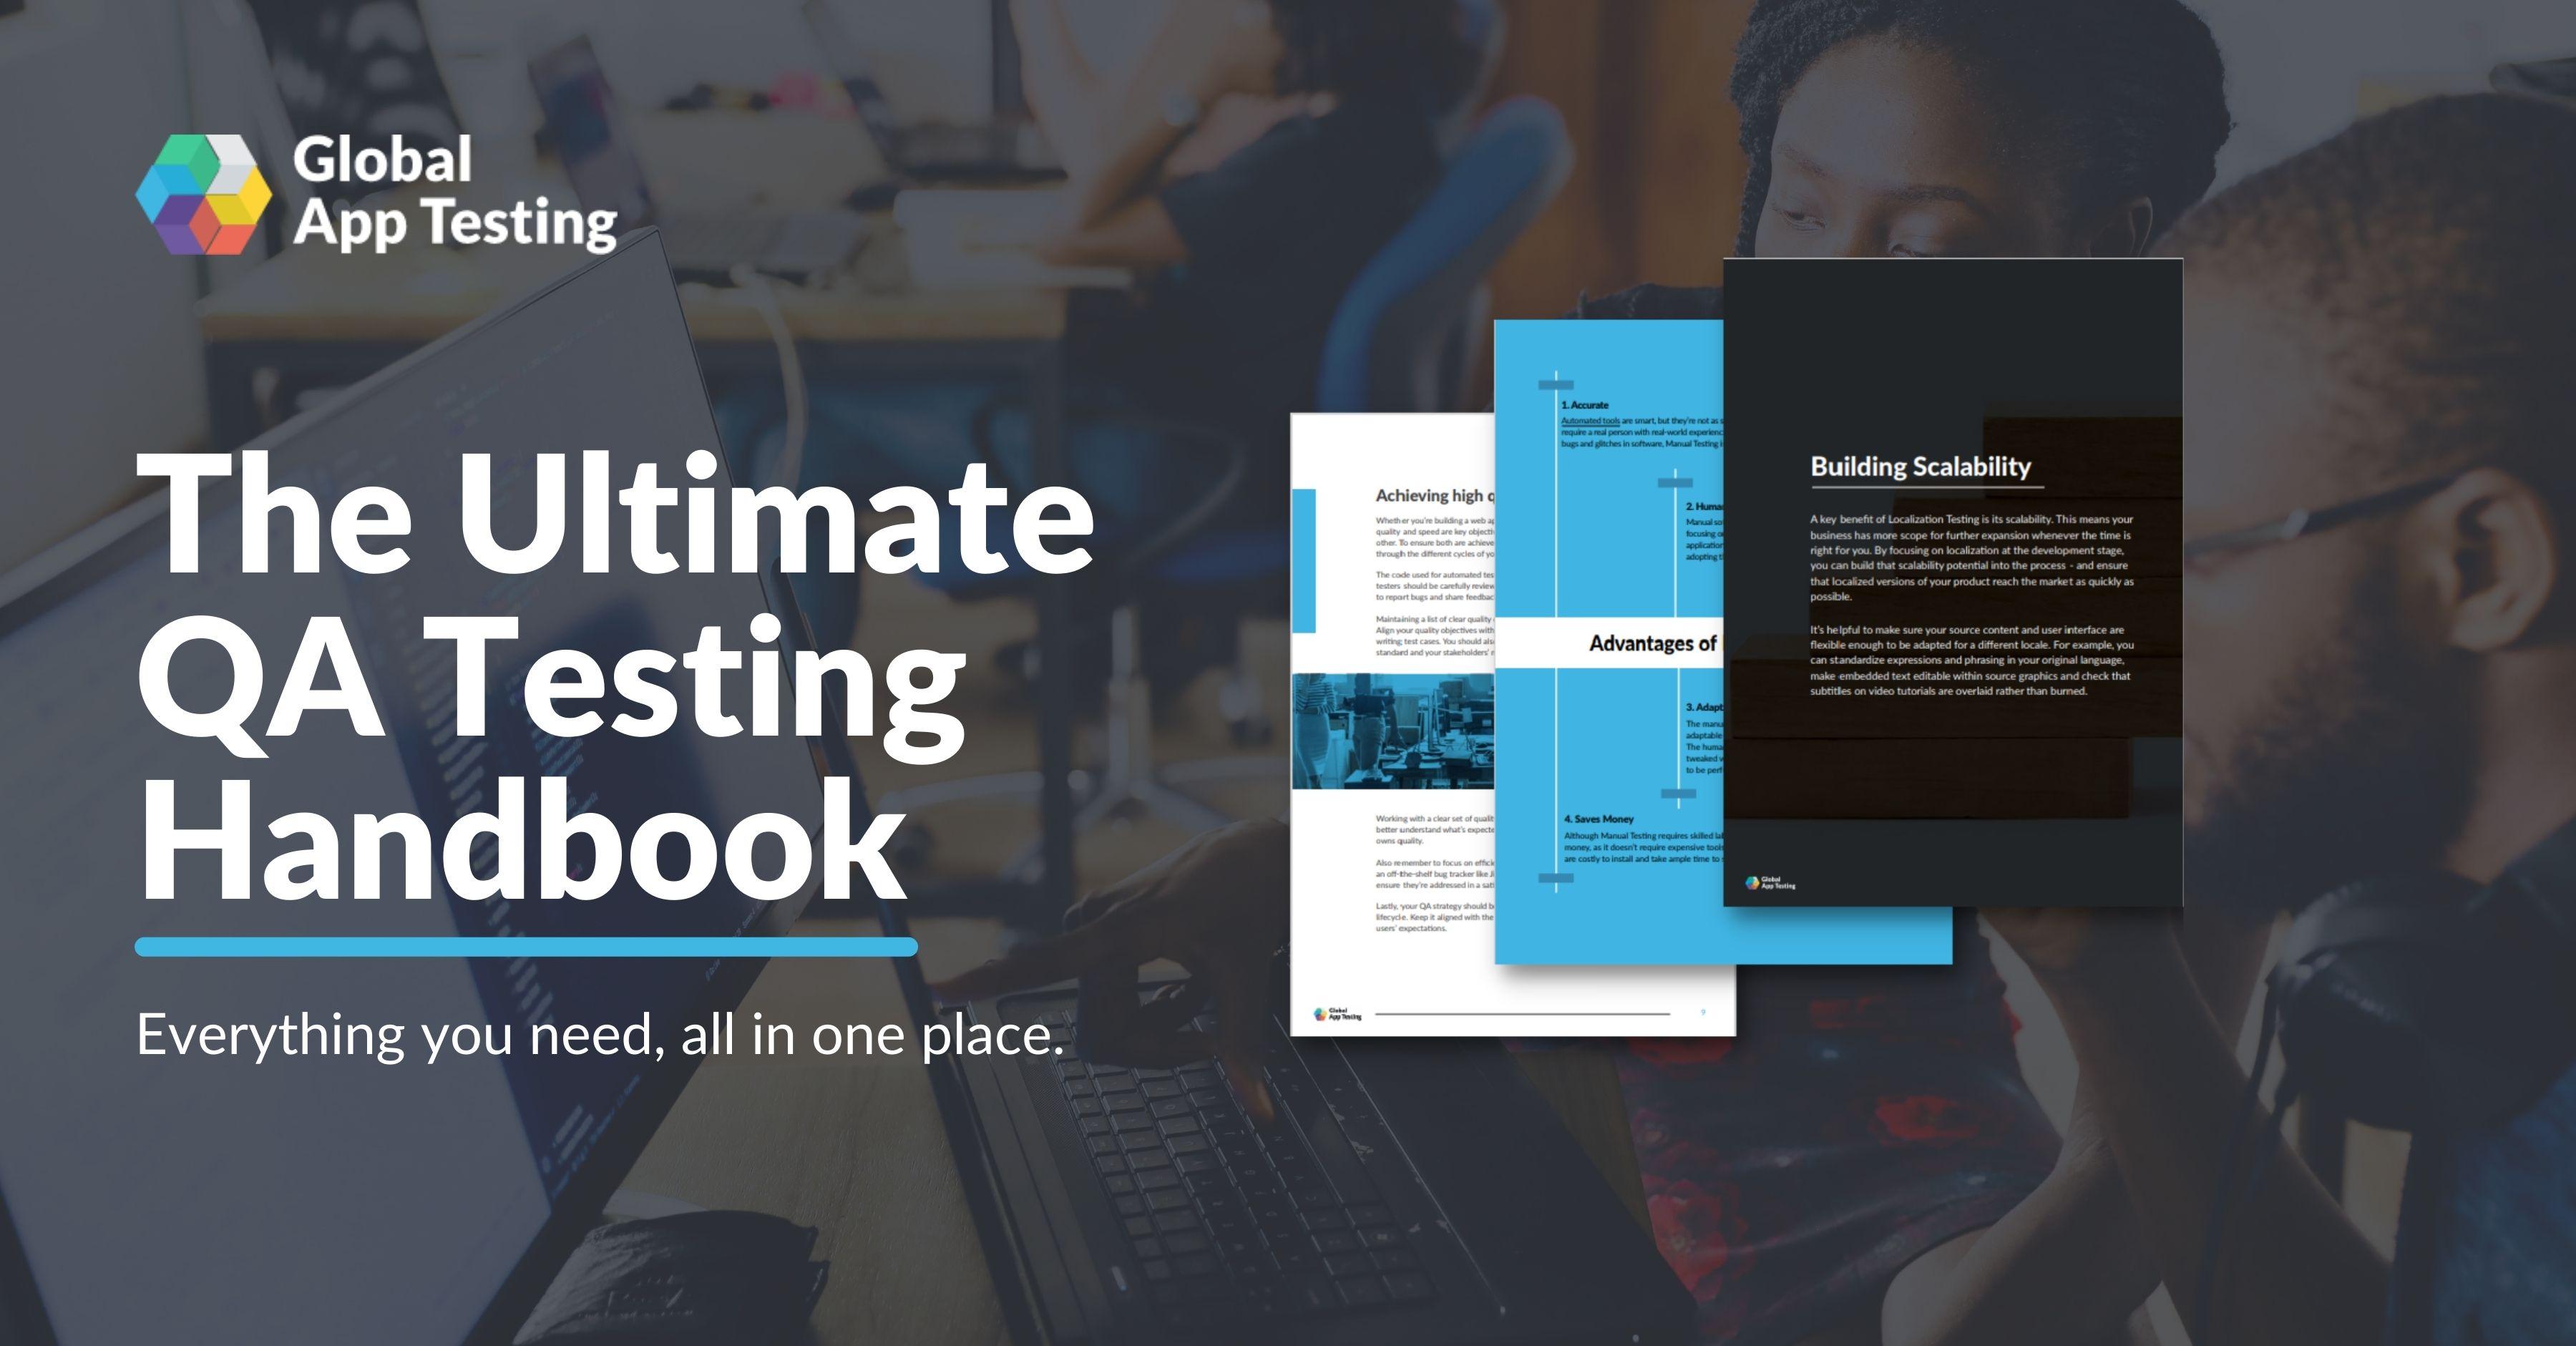 The Ultimate QA Testing Handbook